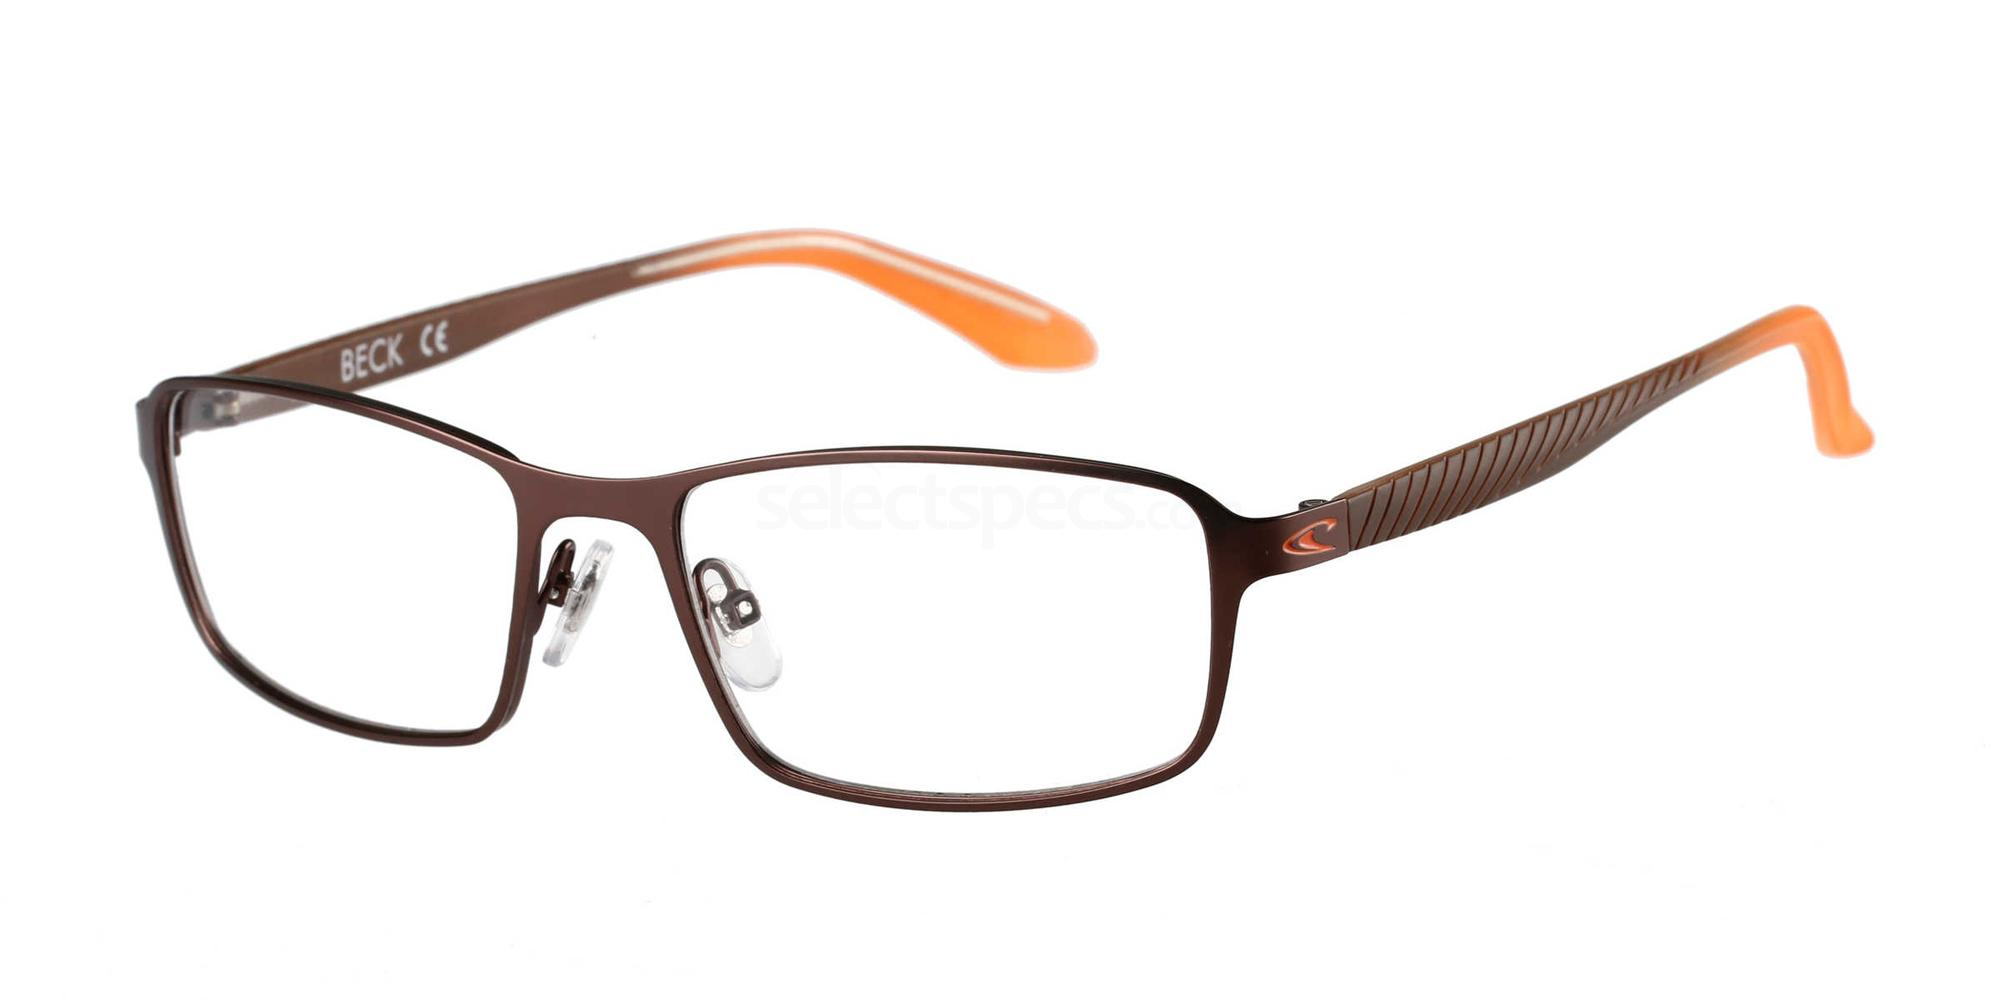 003 ONO-BECK Glasses, O'Neill